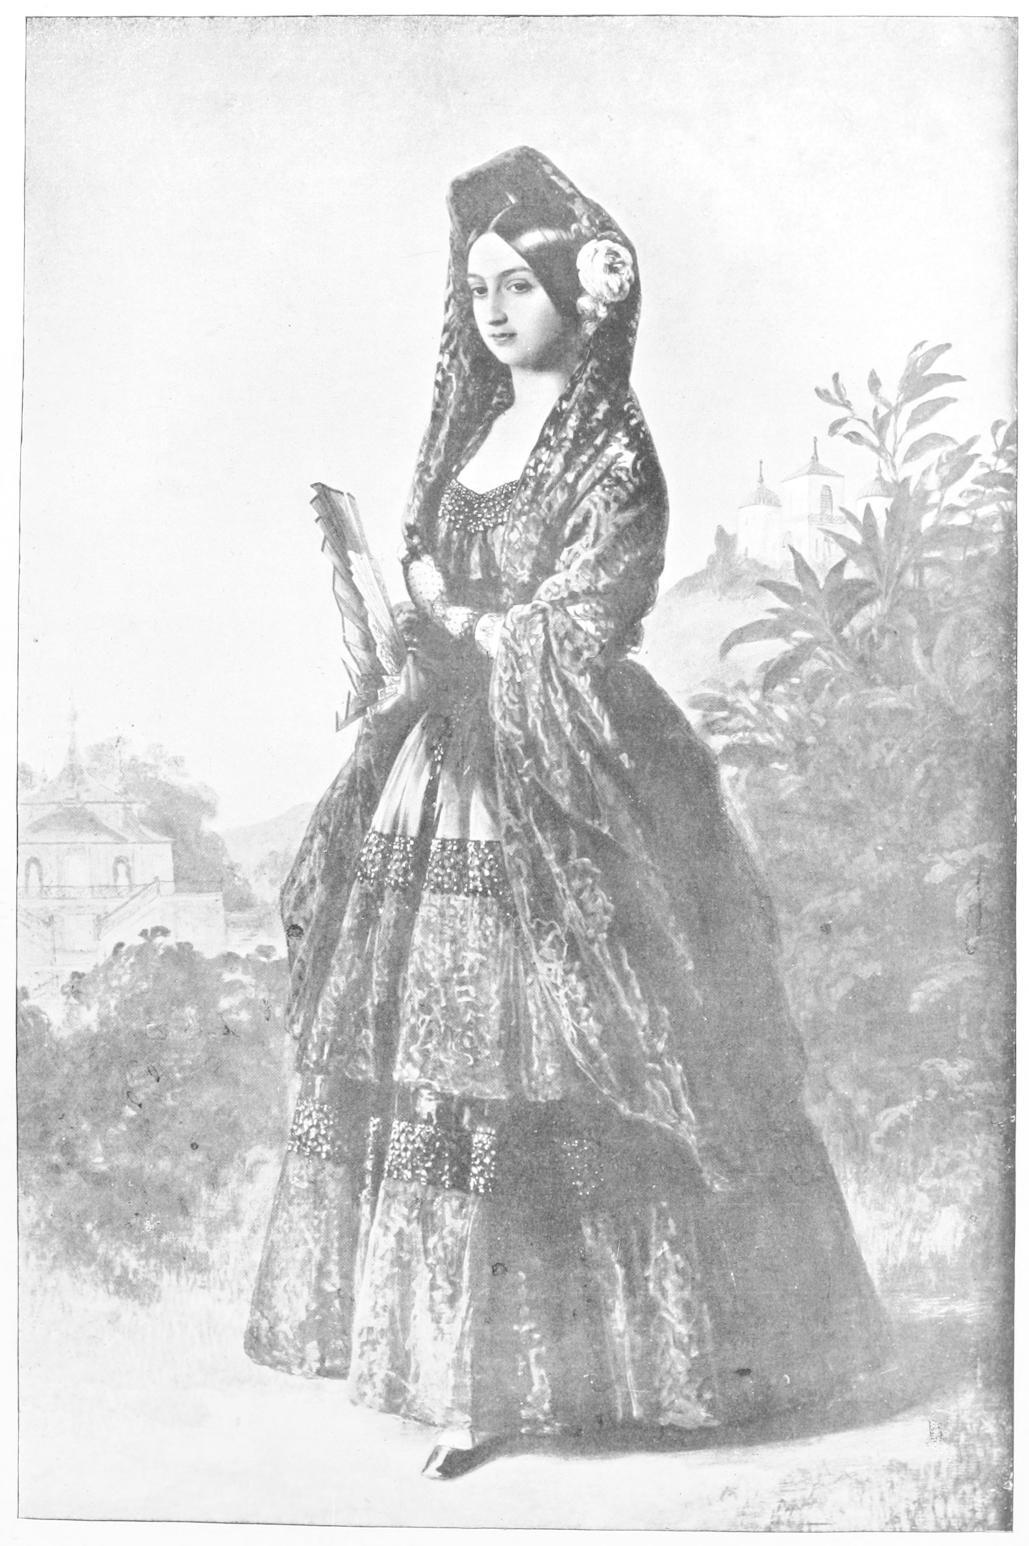 bd0b3c4594 Woman in full length dress with veil